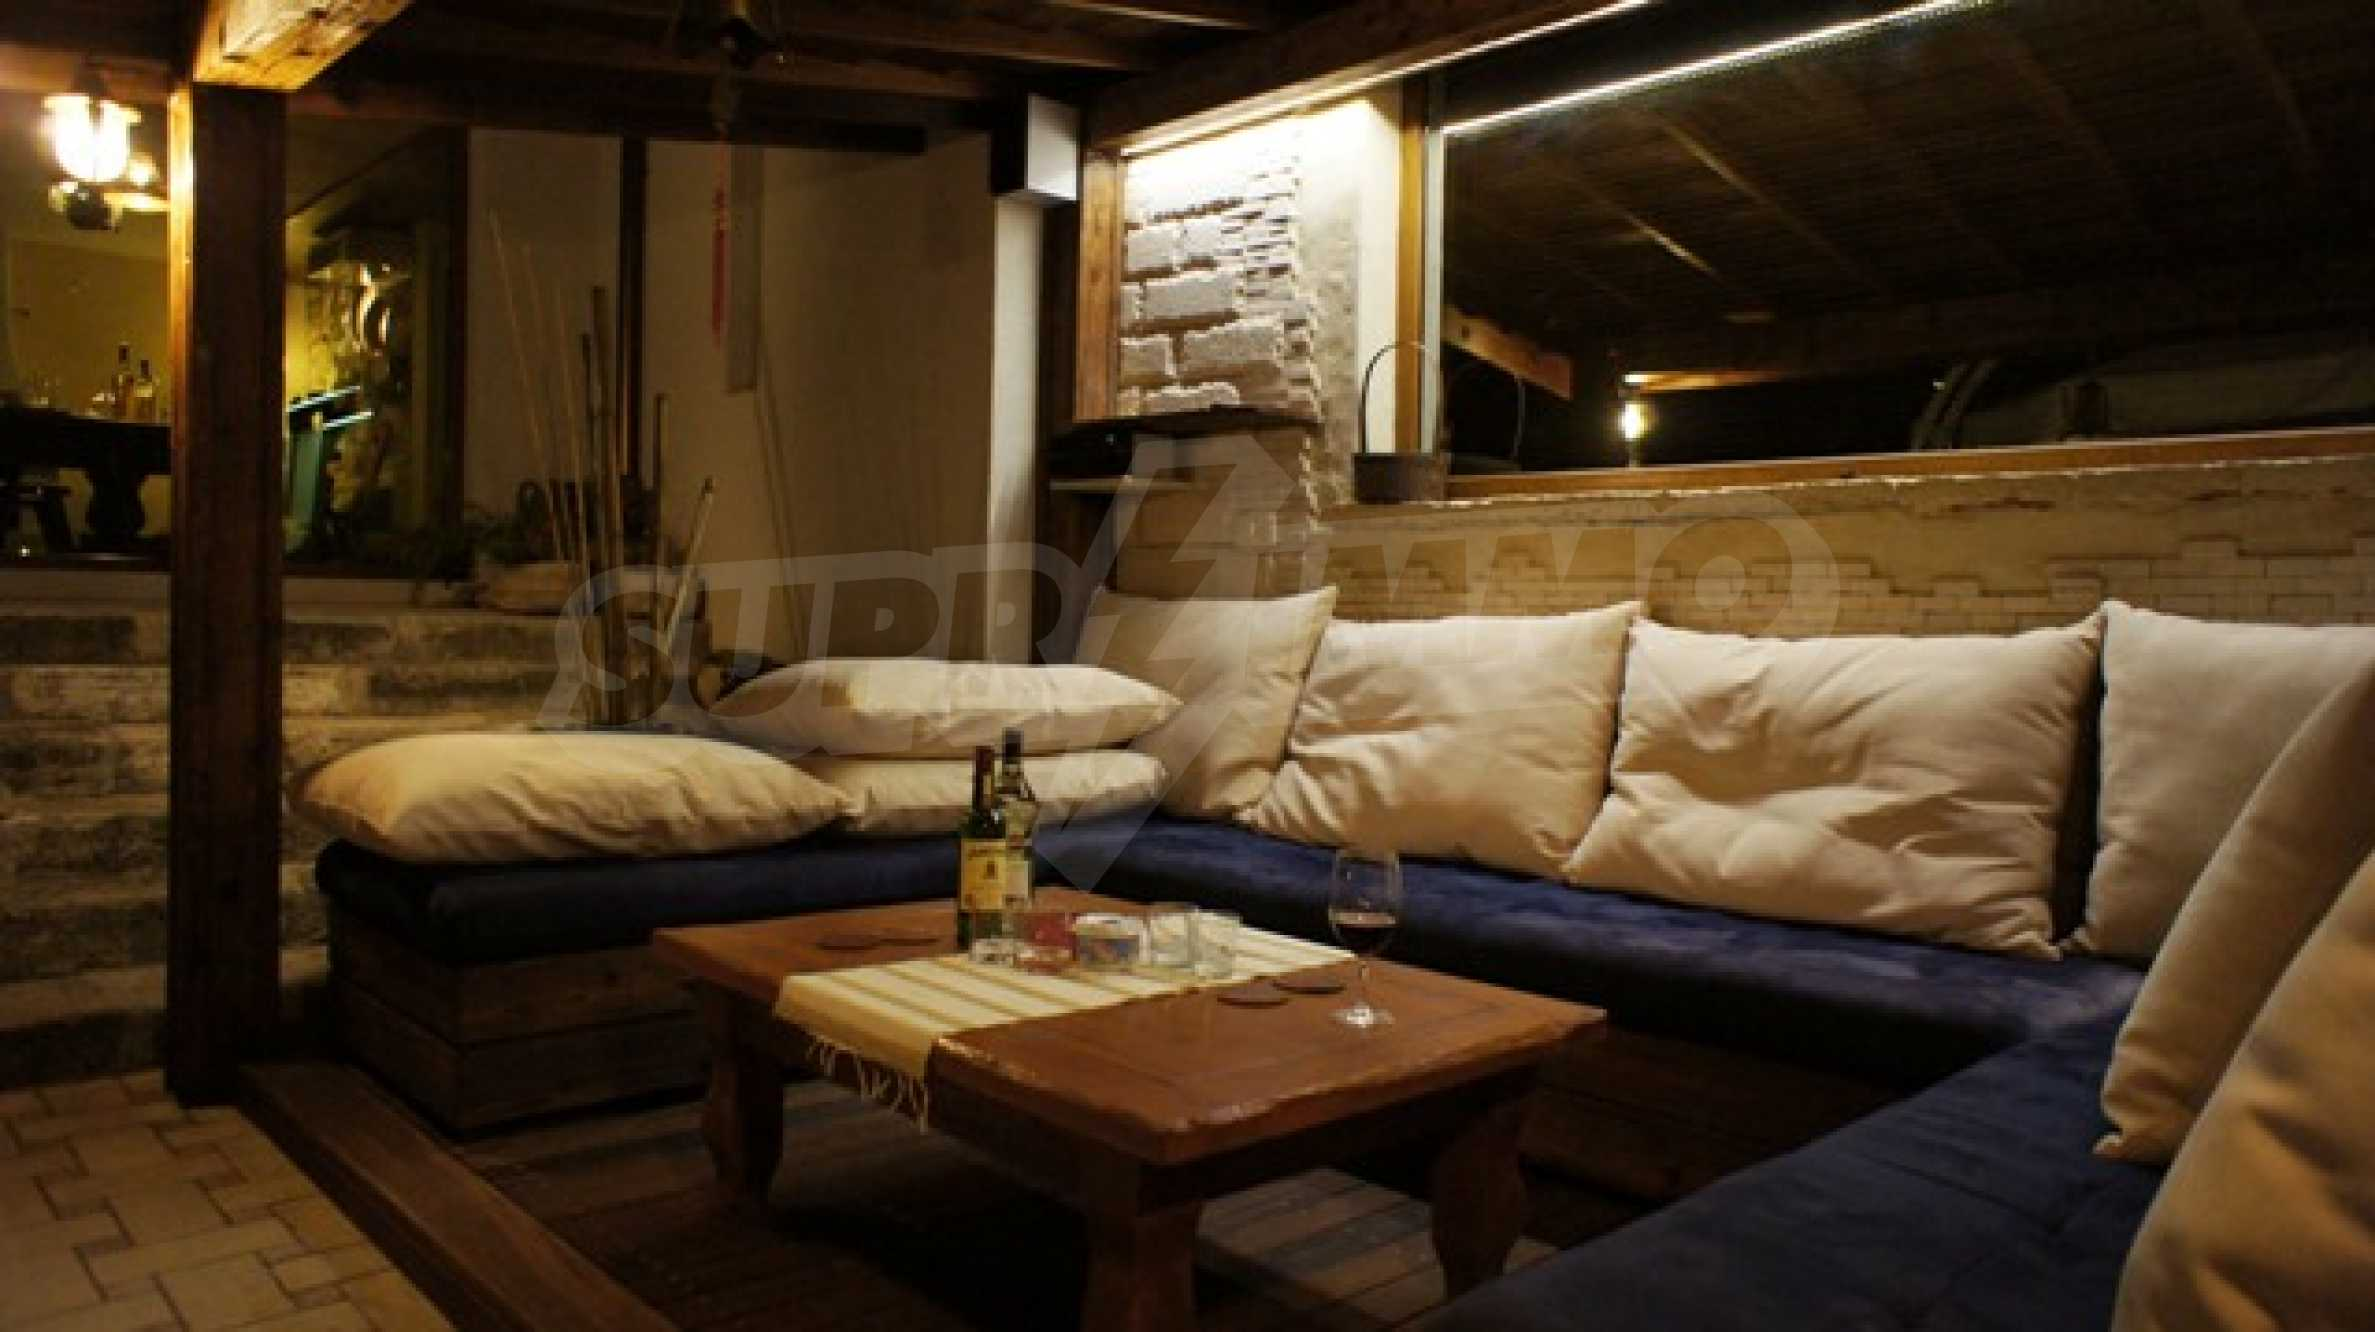 The Mediterranean style - a sense of luxury 60